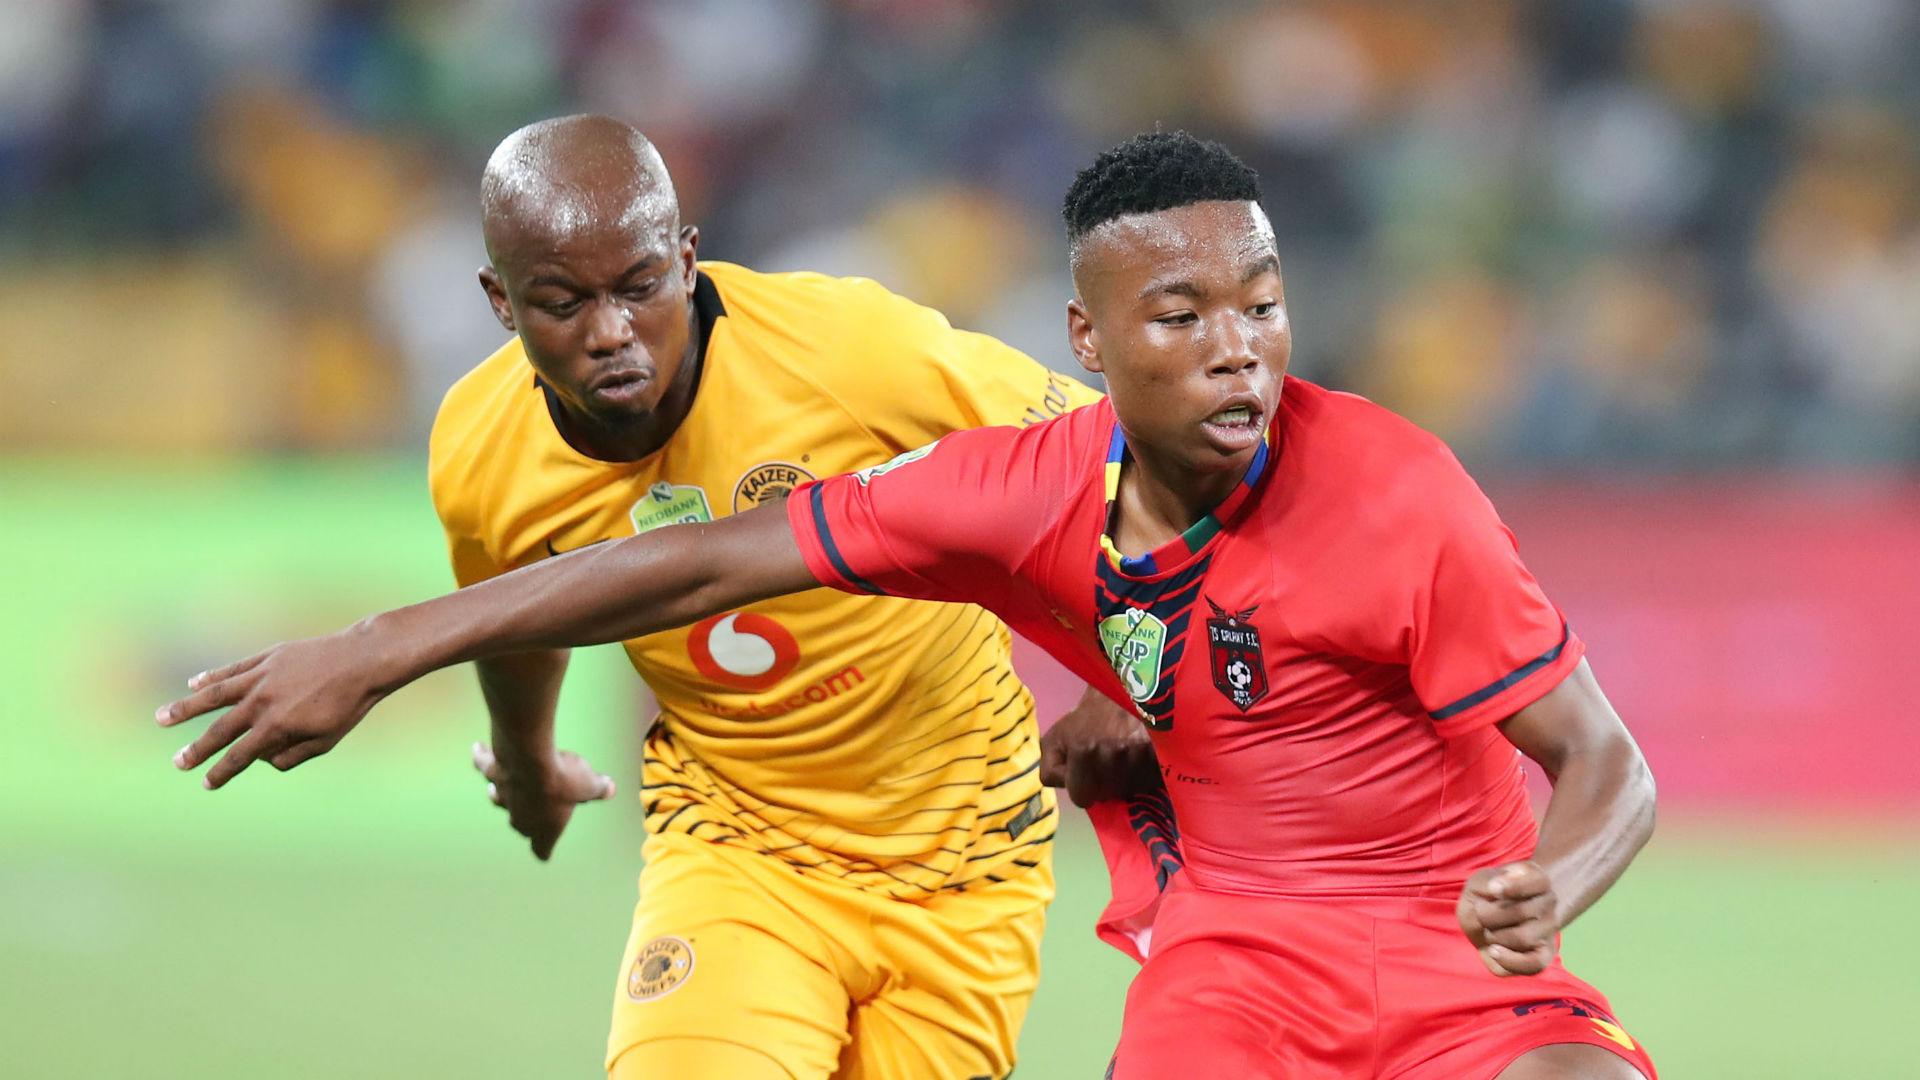 Tshegofatso Nyama of TS Galaxy challenged by Siphosakhe Ntiya-Ntiya of Kaizer Chiefs , May 2019